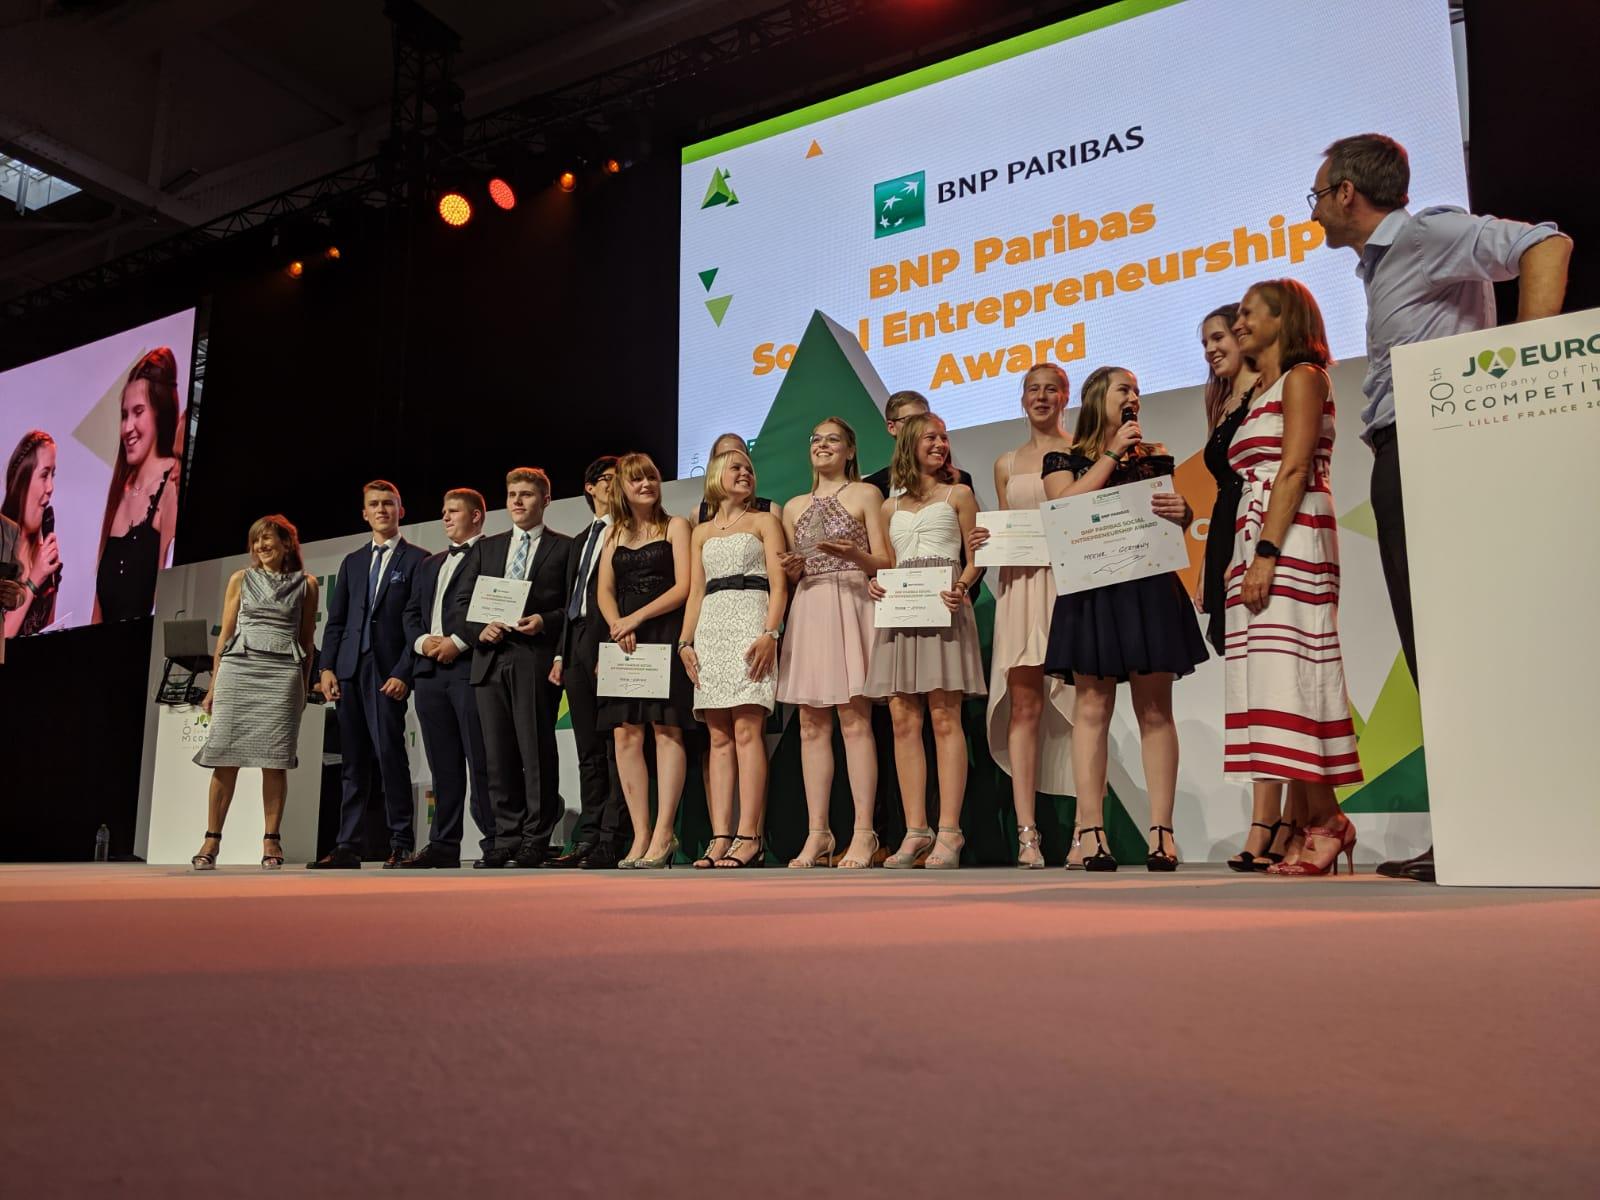 Meehr Schülerfirma, winner of the 2019 BNP Paribas Social Entrepreneurship Award.